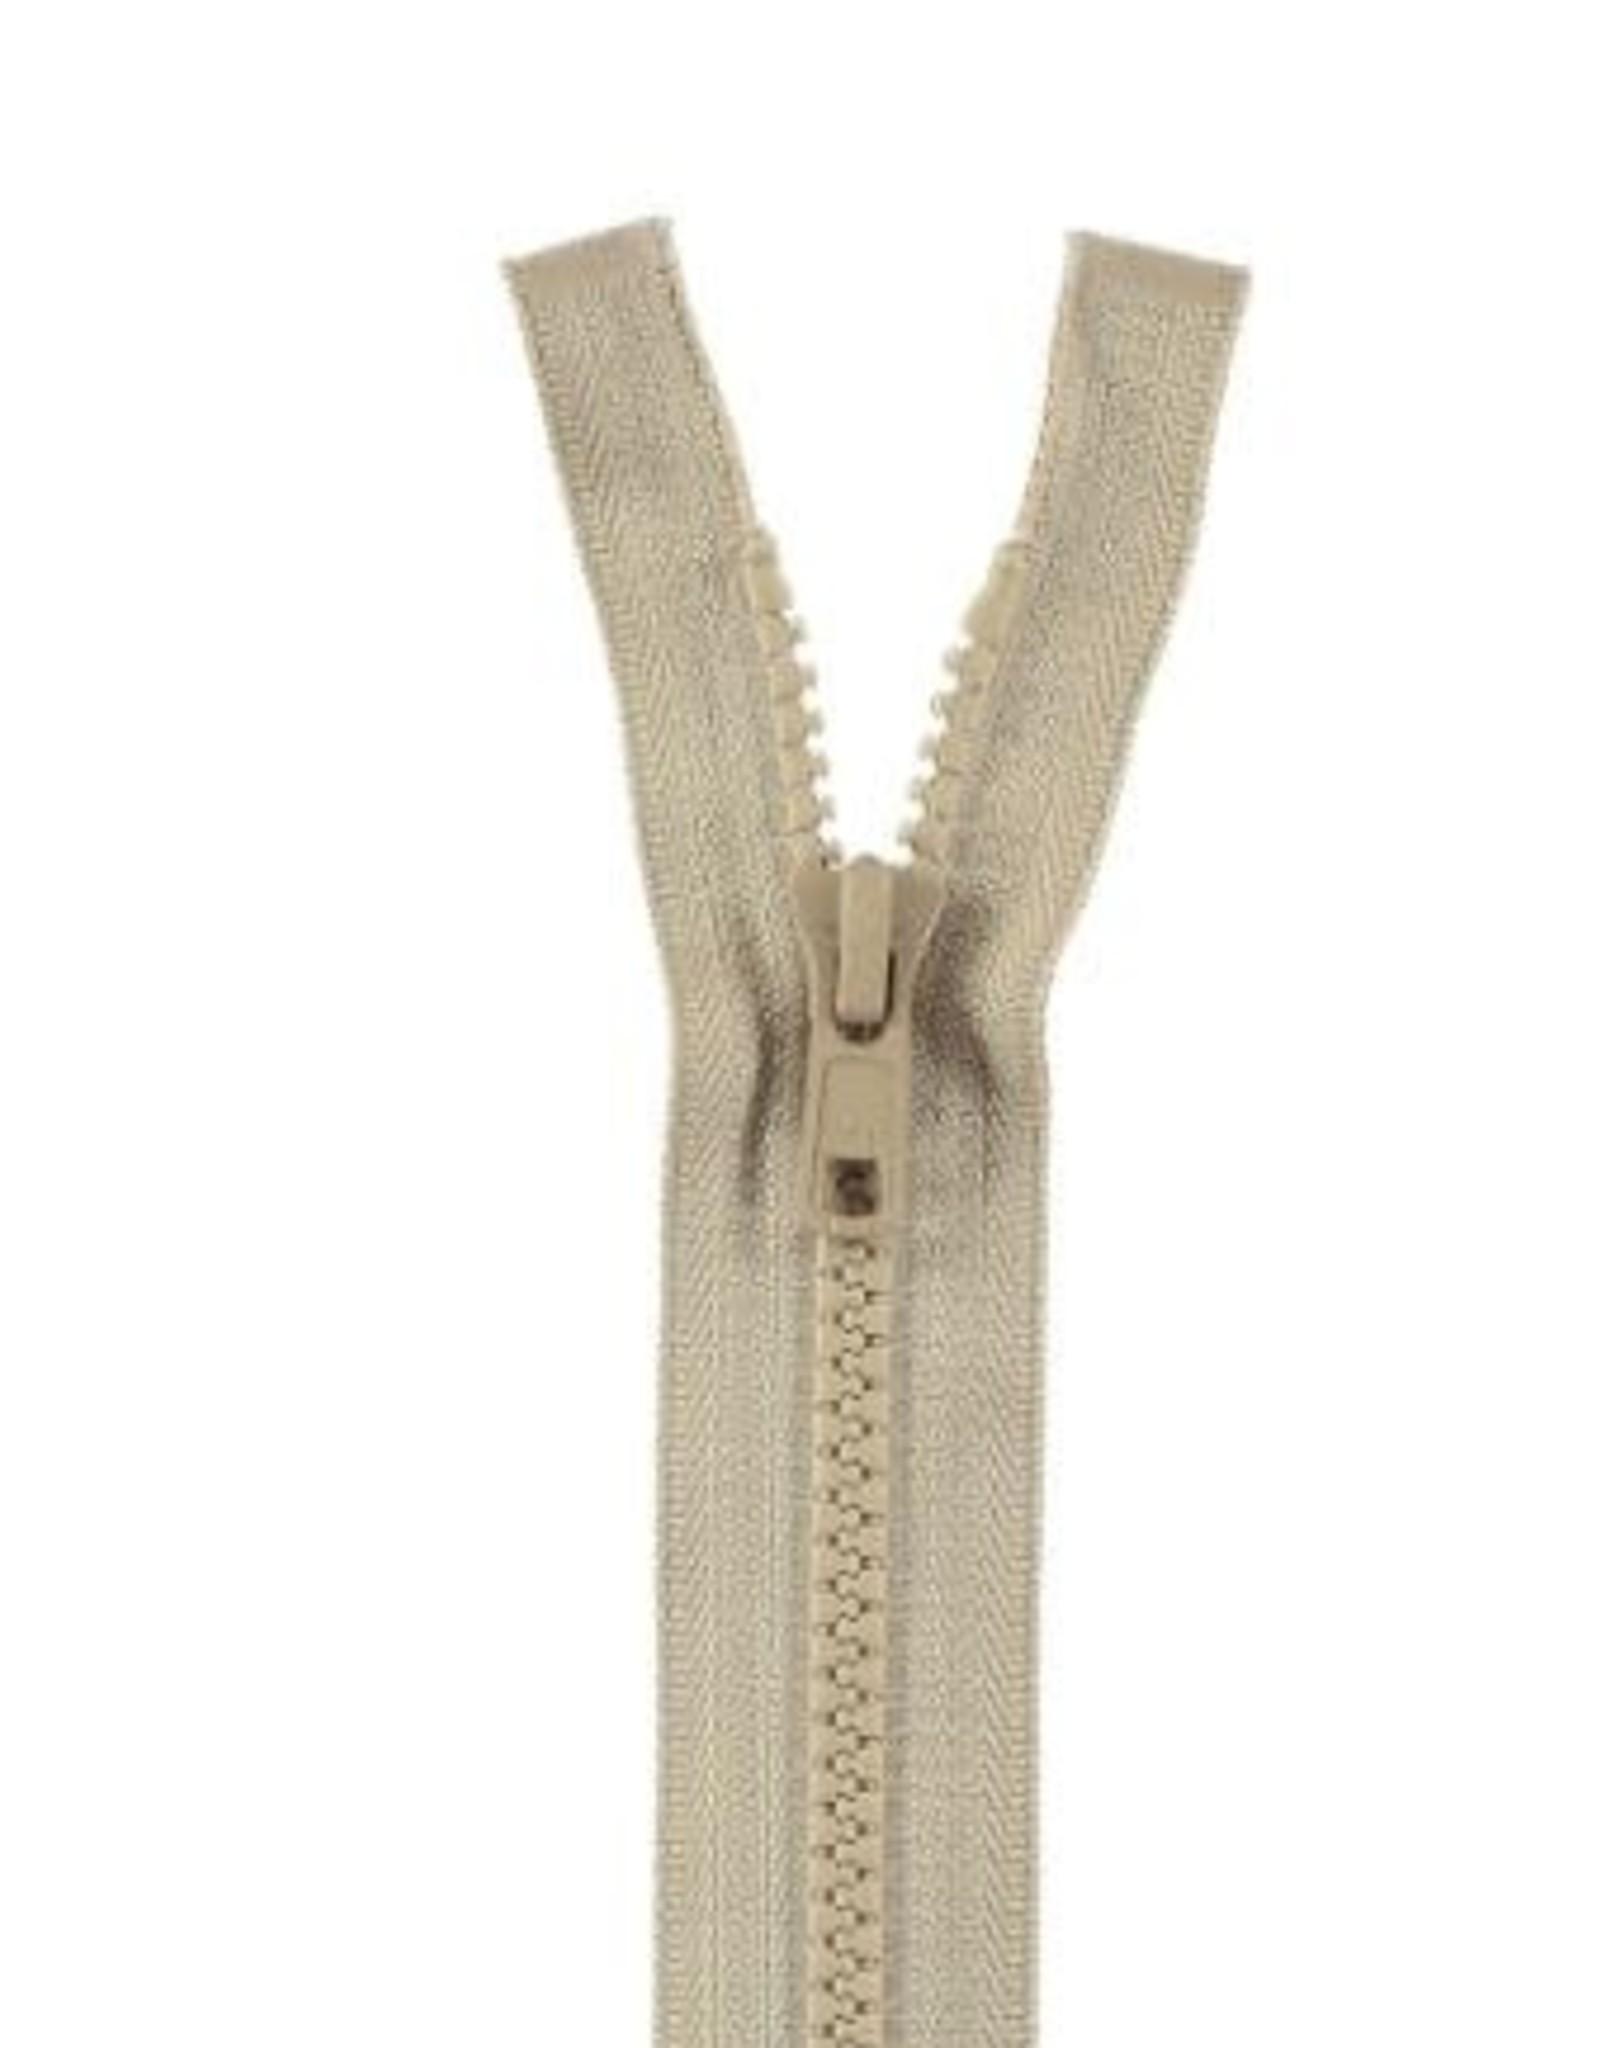 YKK BLOKRITS 5 DEELBAAR beige 573-70cm